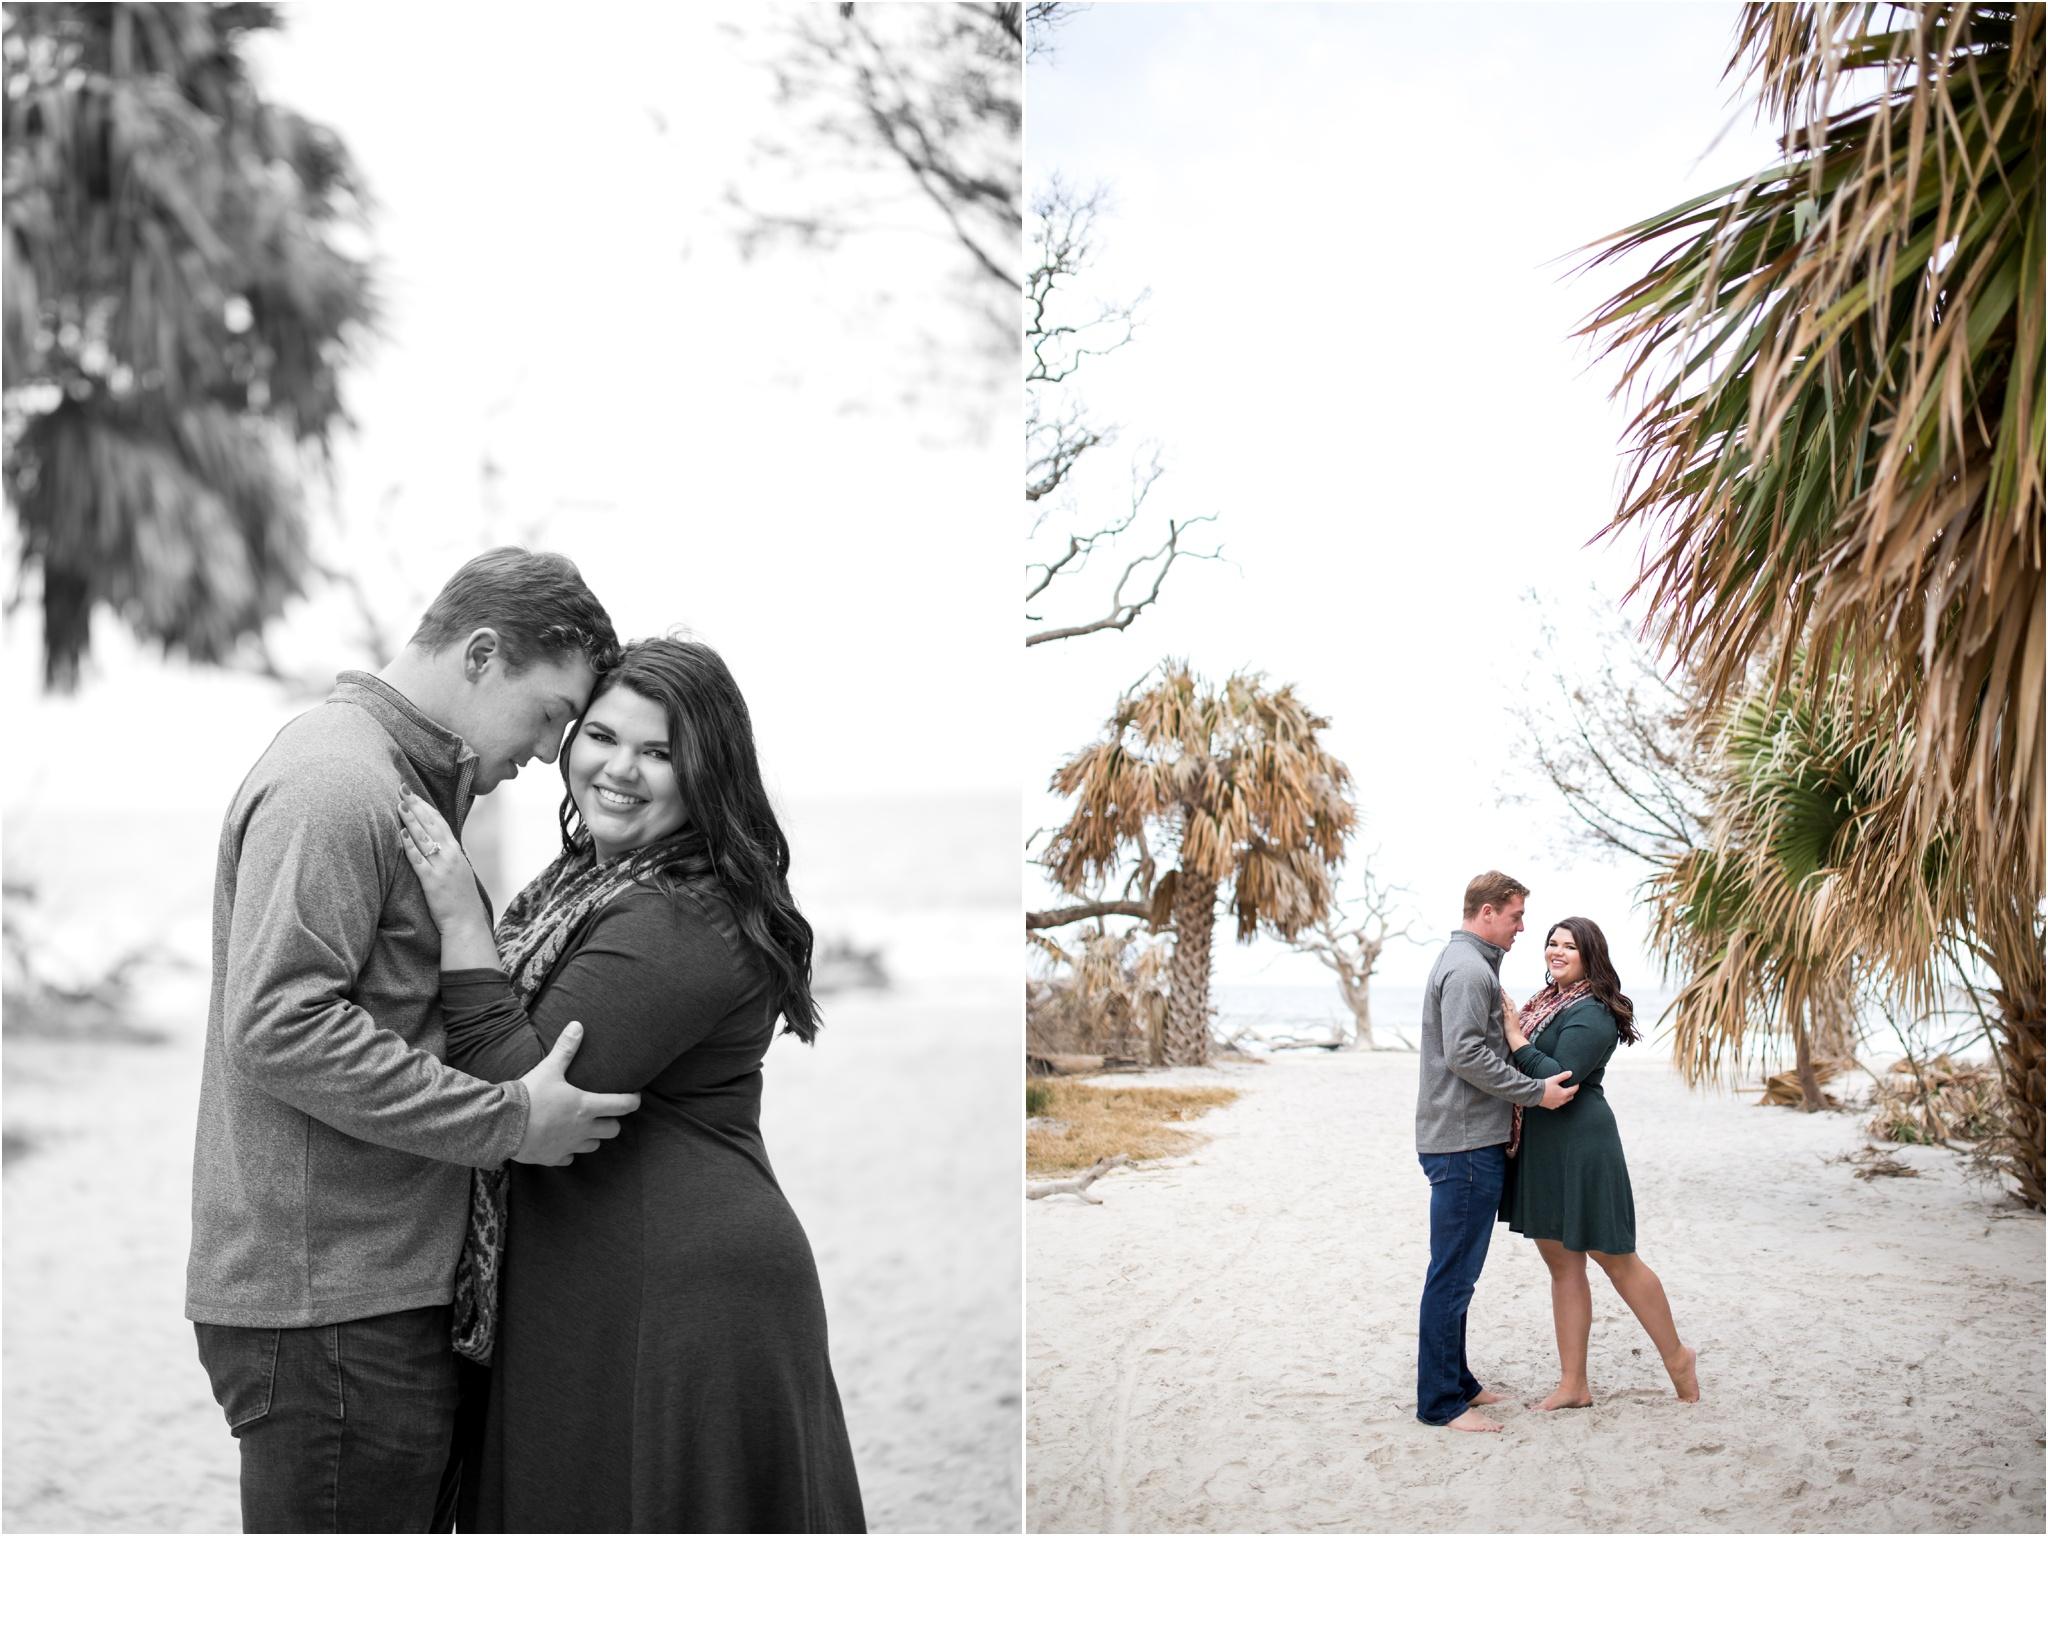 Rainey_Gregg_Photography_St._Simons_Island_Georgia_California_Wedding_Portrait_Photography_0586.jpg